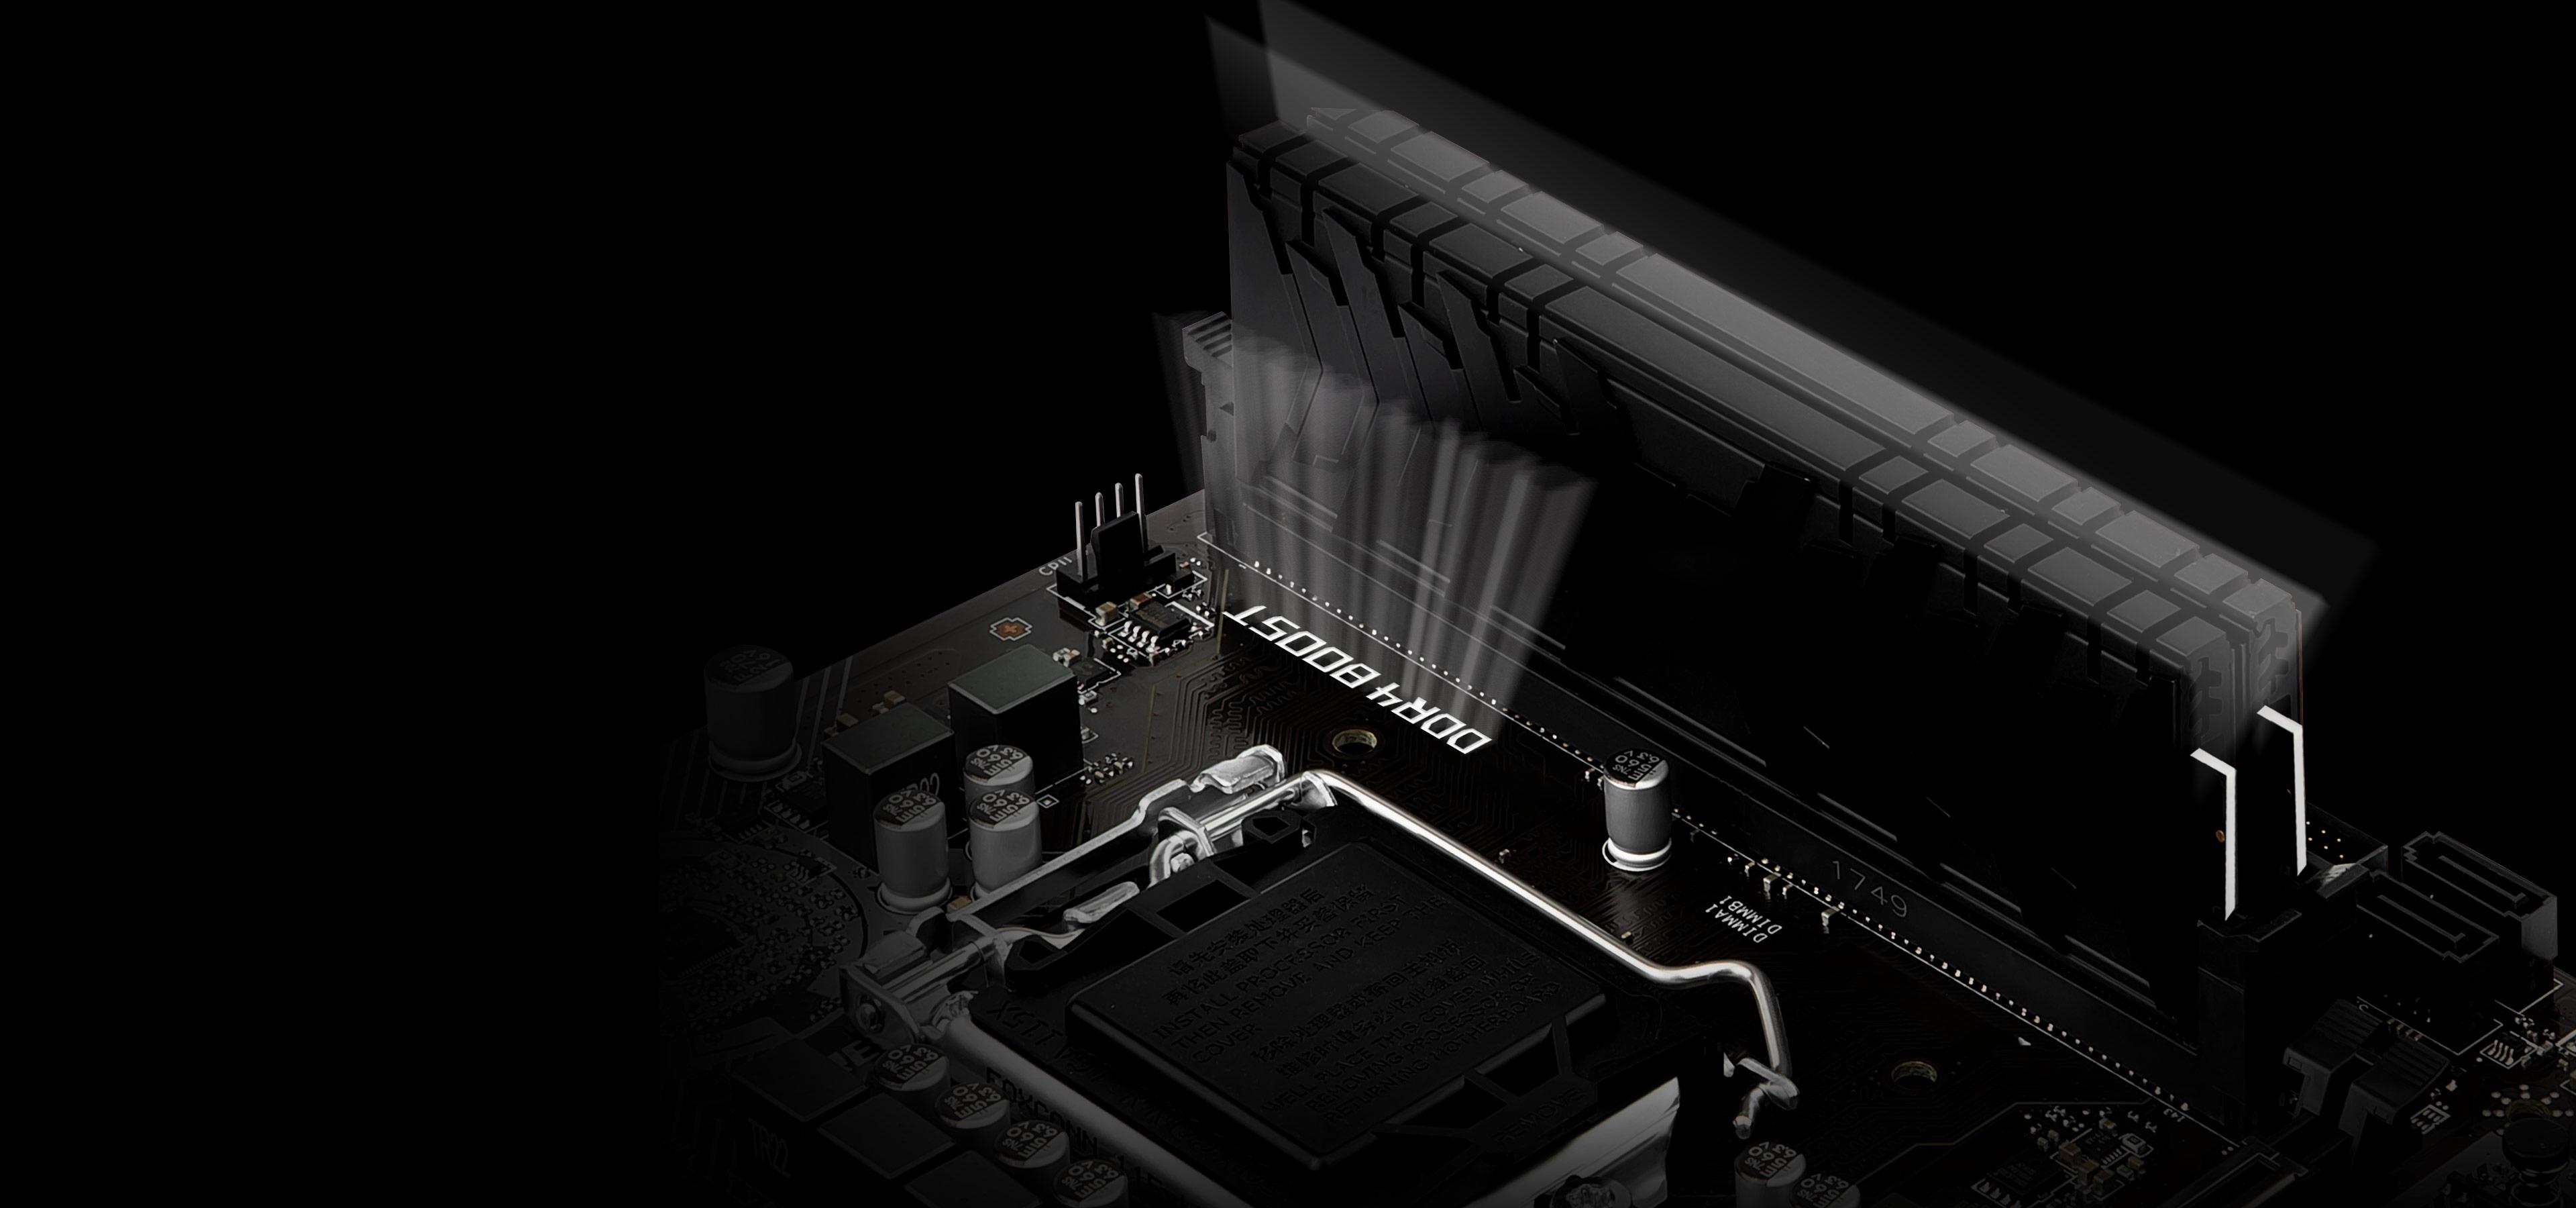 H310M PRO-VD | Motherboard - The world leader in motherboard design